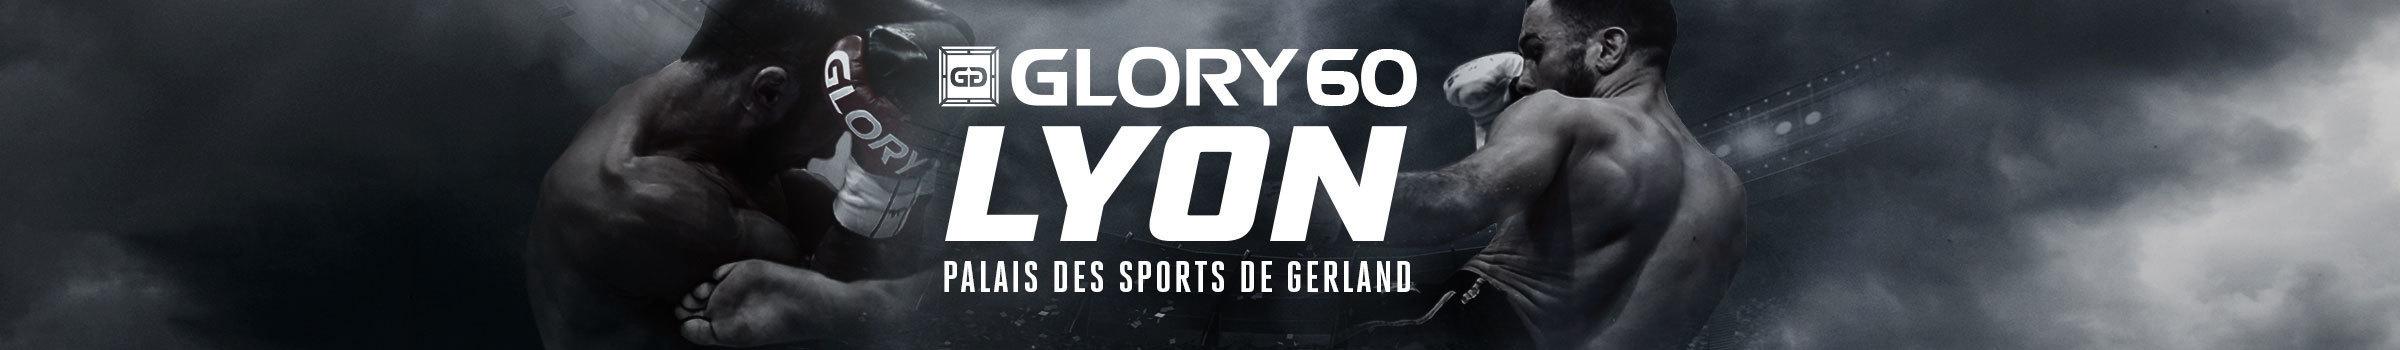 GLORY 60 Lyon